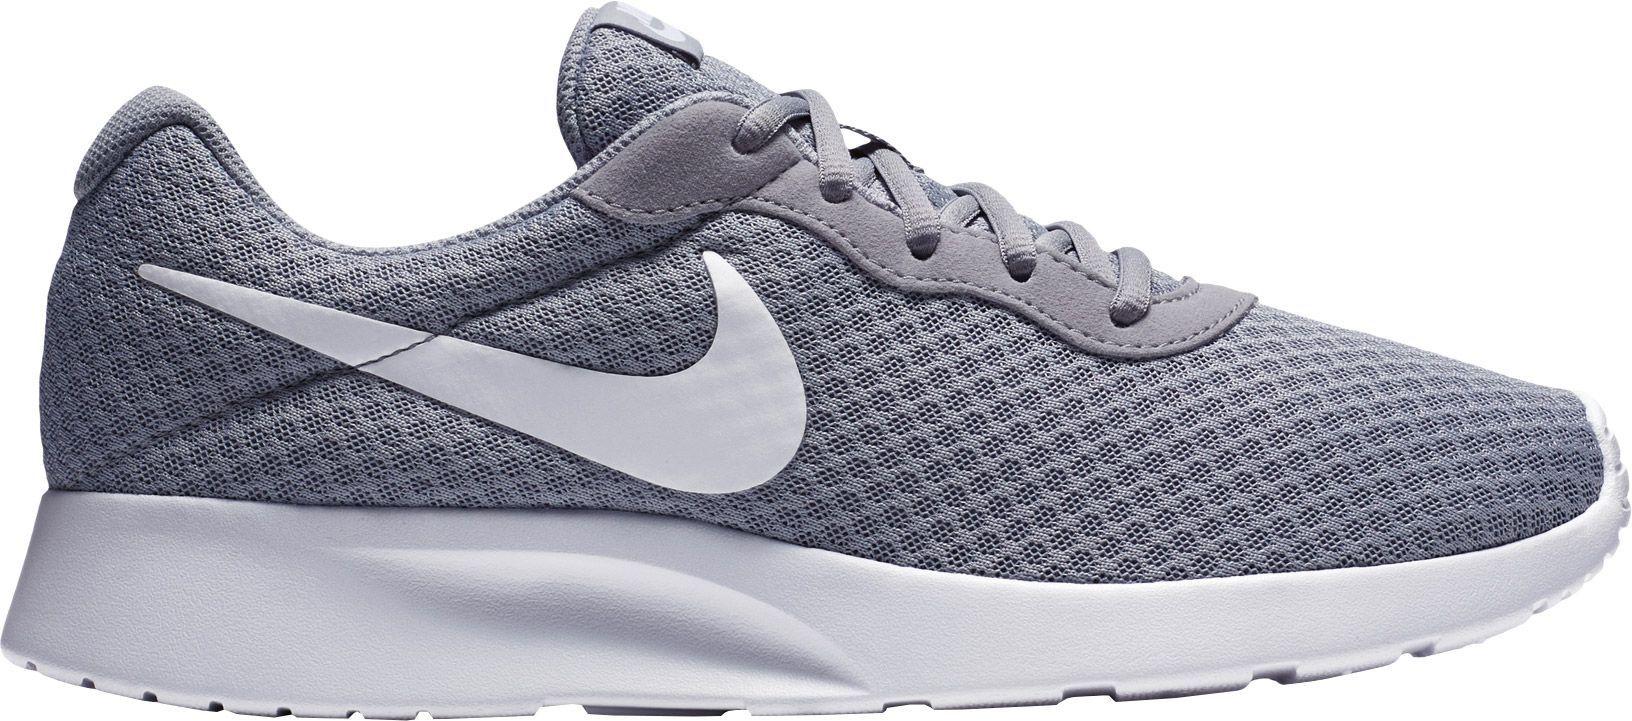 newest 898fa 8af93 Nike Men s Tanjun Shoes, Size  11.5, Gray